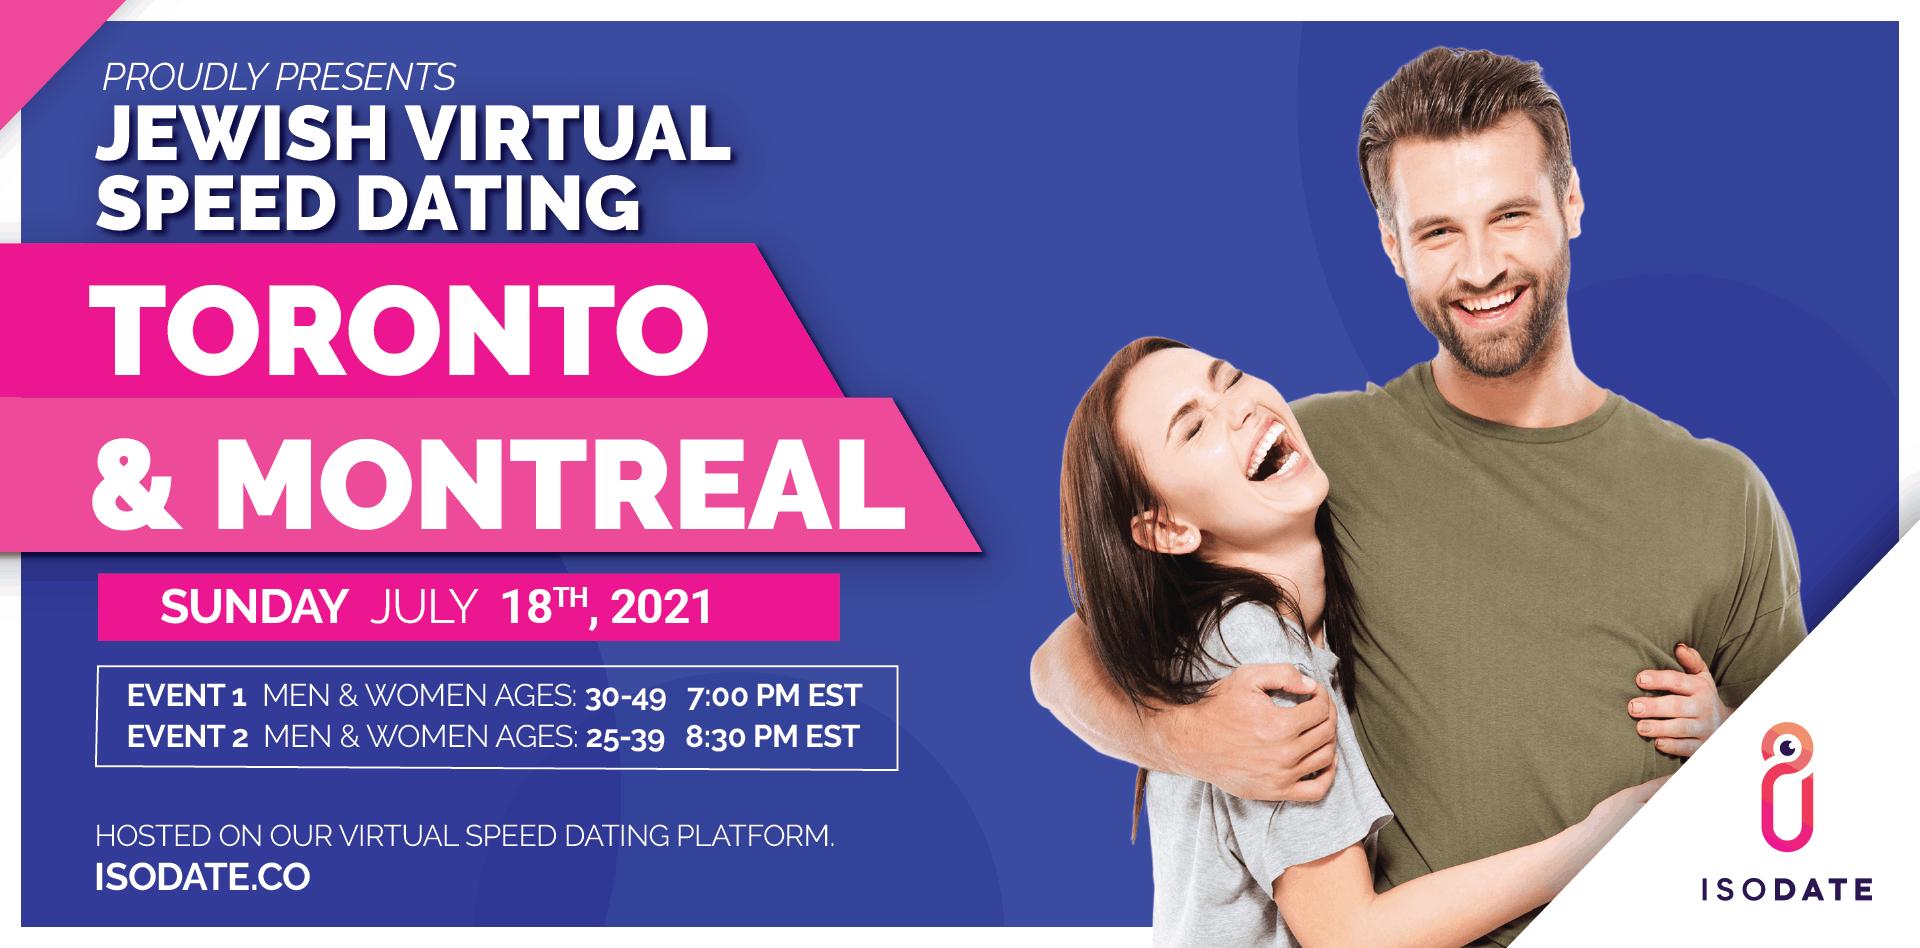 Isodate's Toronto & Montreal Jewish Virtual Speed Dating